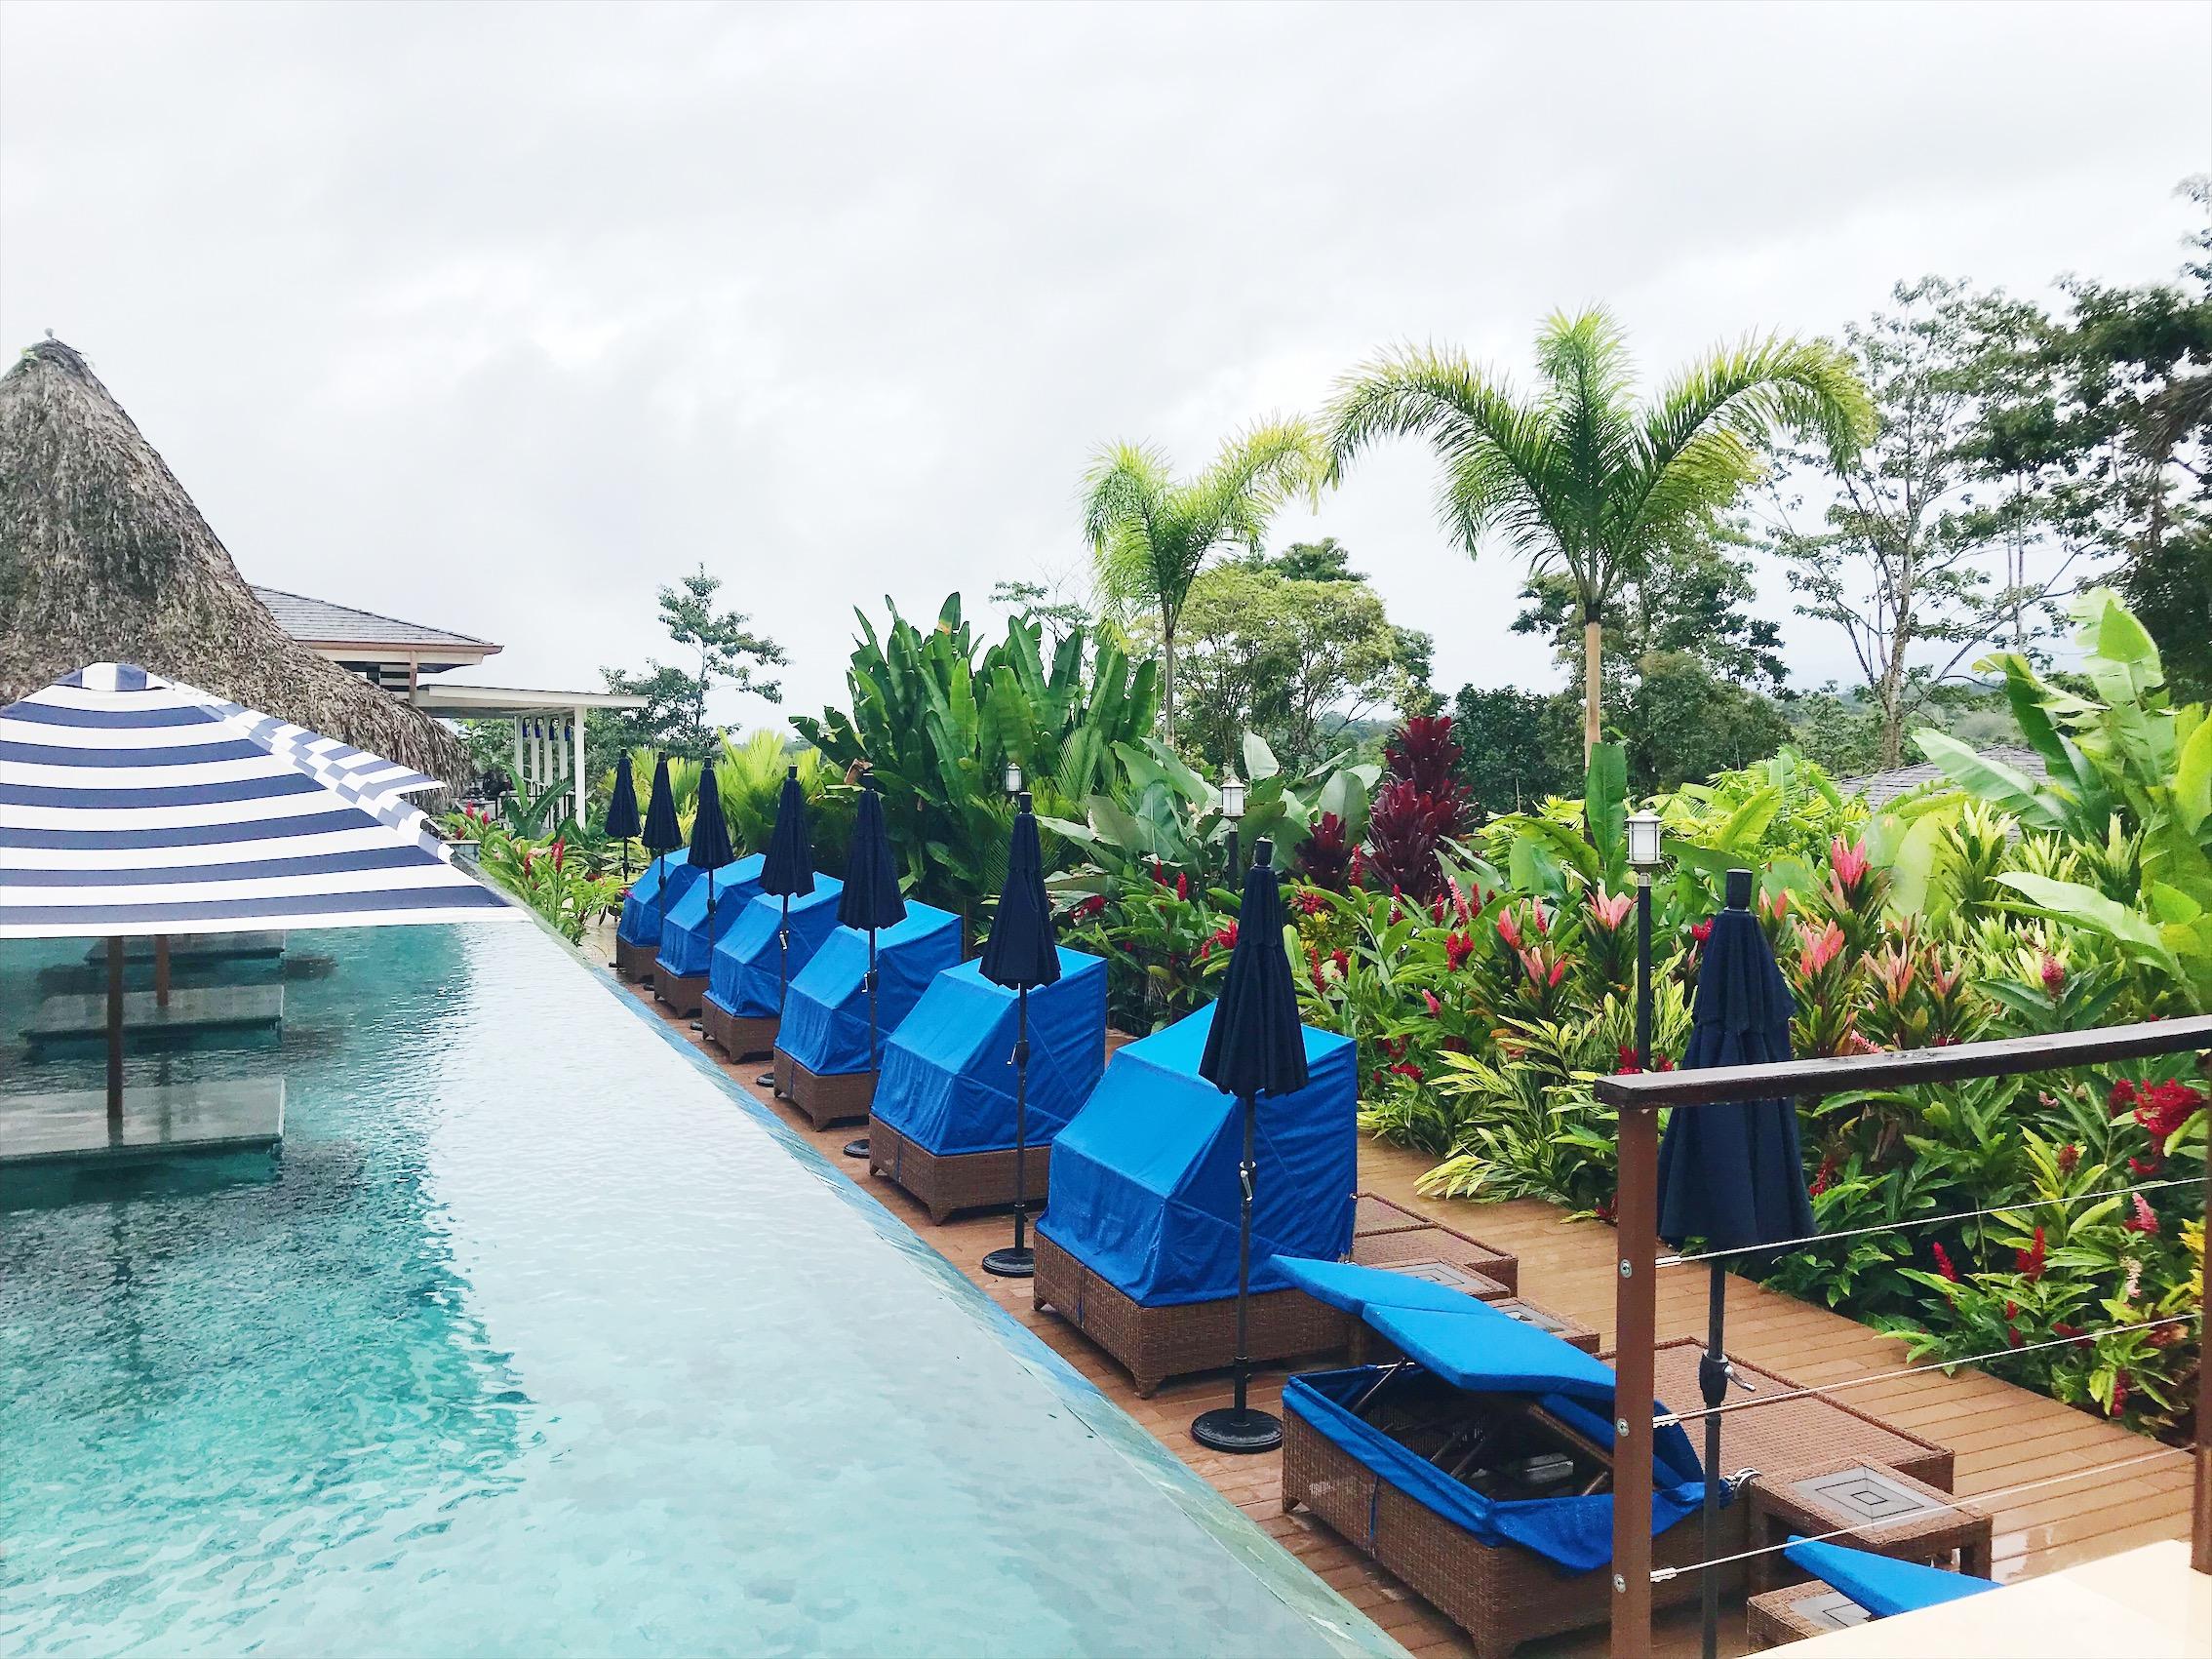 How to plan the best honeymoon in Costa Rica